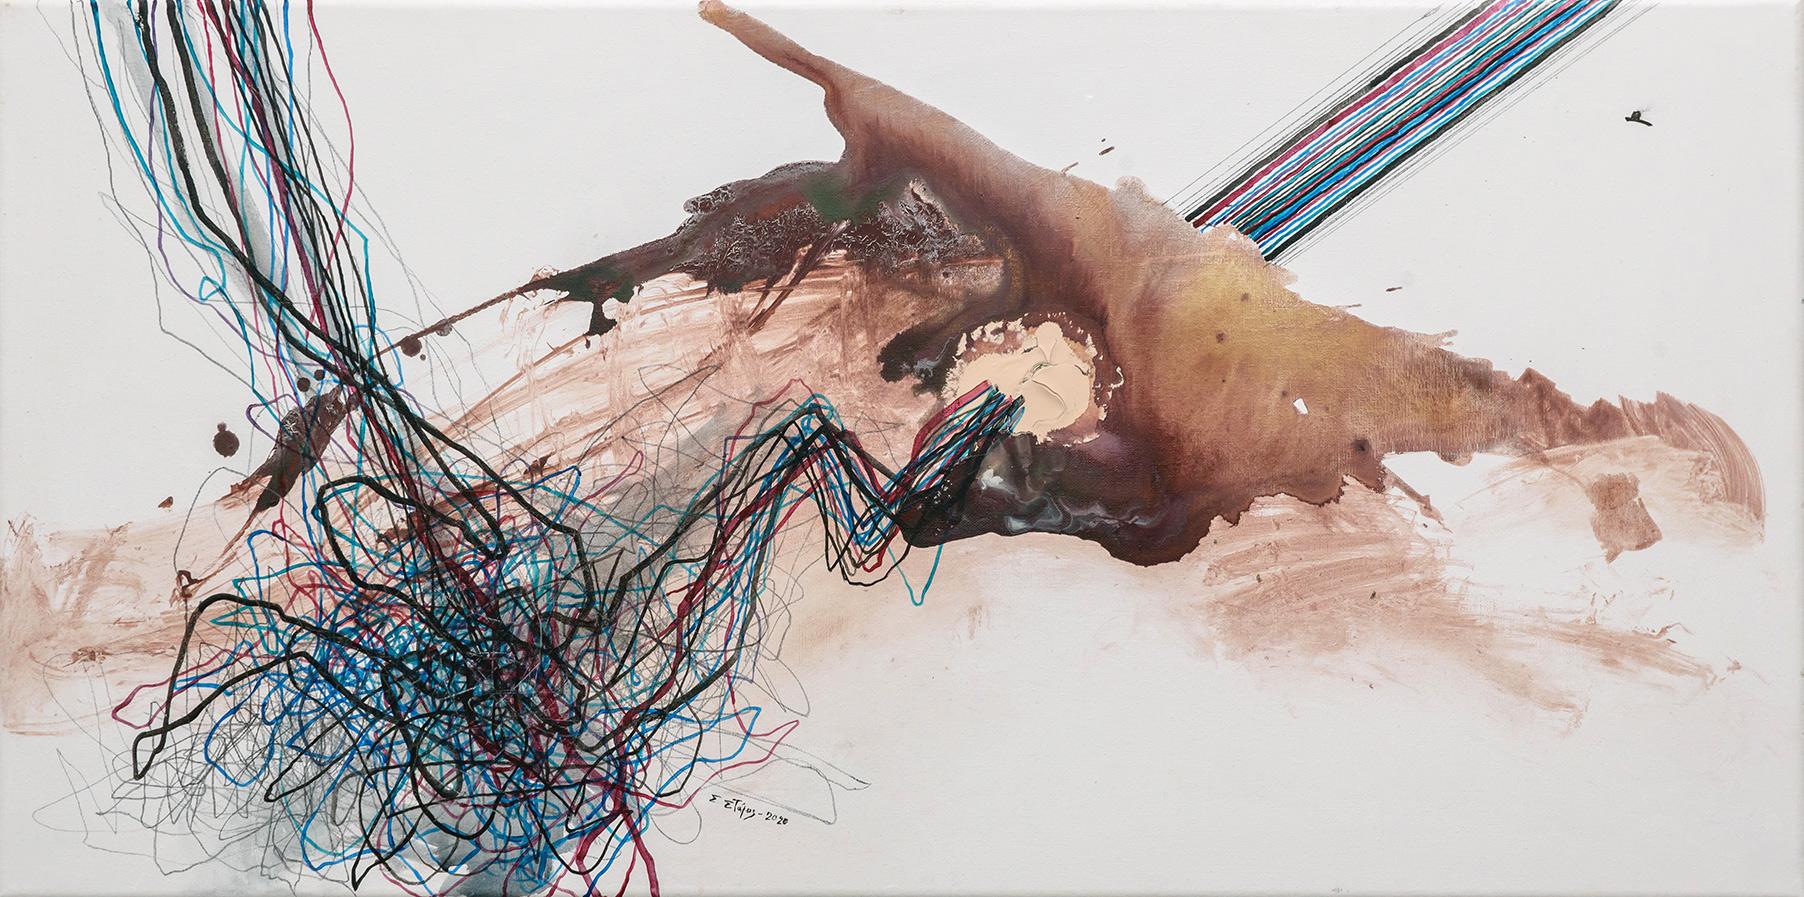 Untitled, Acrylics on canvas, 50 x 100 cm, 2020, Trikala